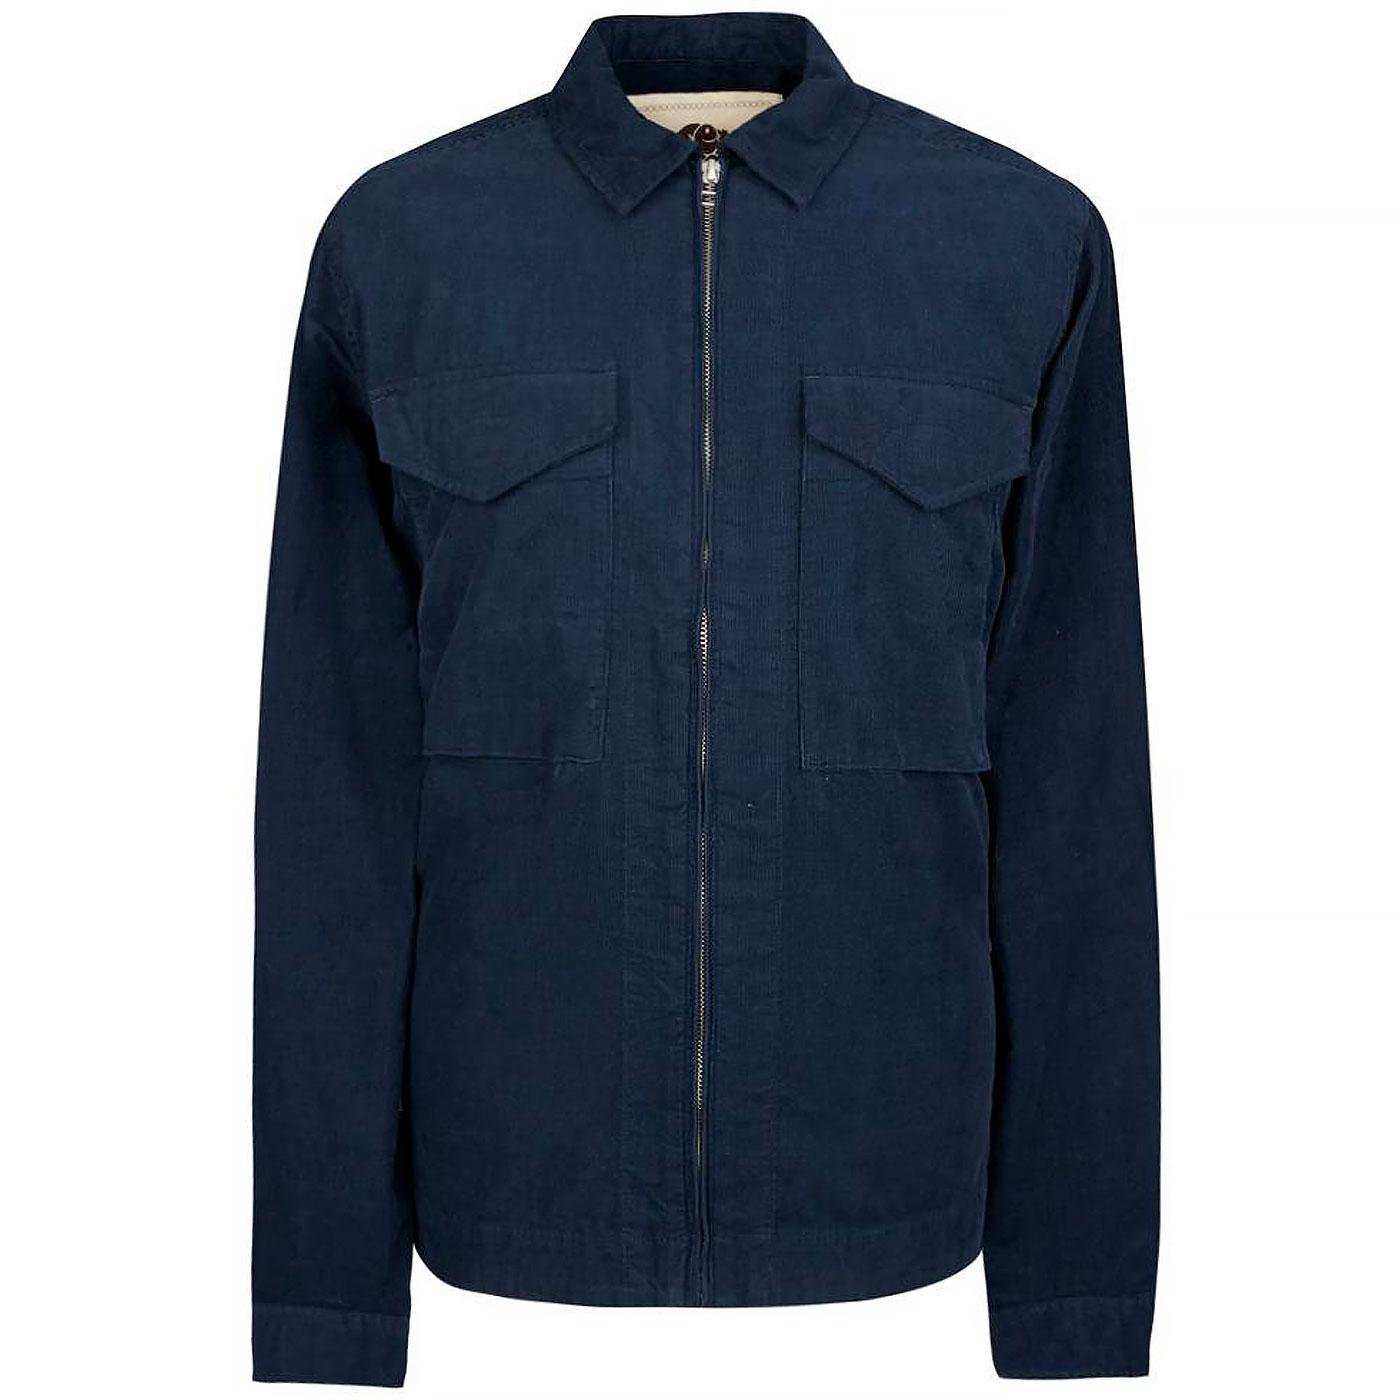 PRETTY GREEN Retro Zip Up Cord Overshirt Jacket N